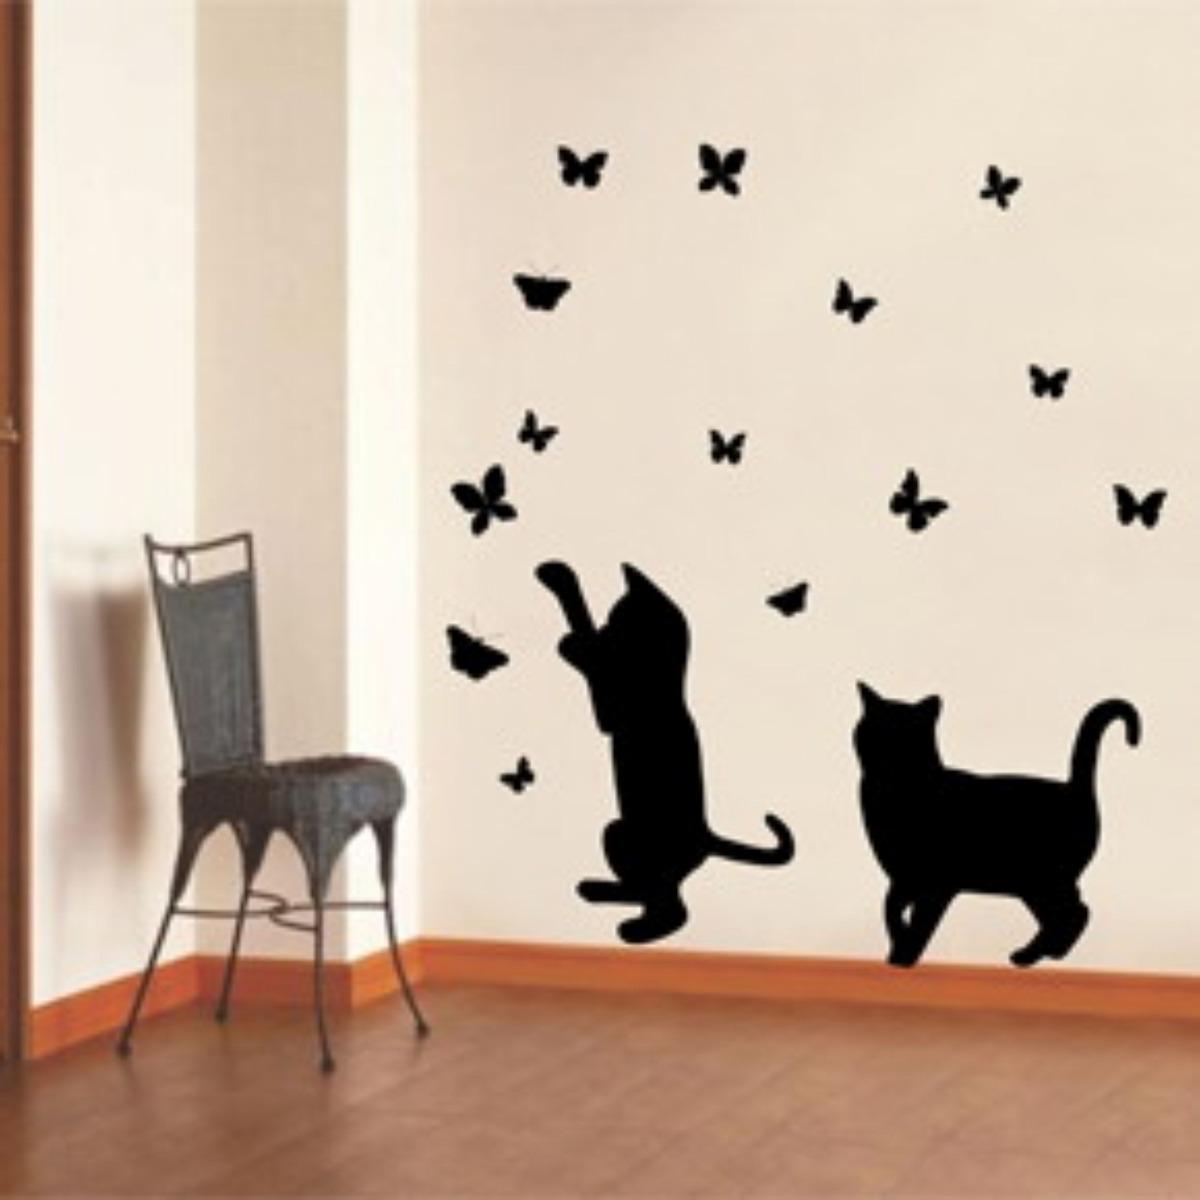 3d Wallpaper For Interior Decoration Adesivo Decorativo Parede Box Gato Passarinho Borboletas